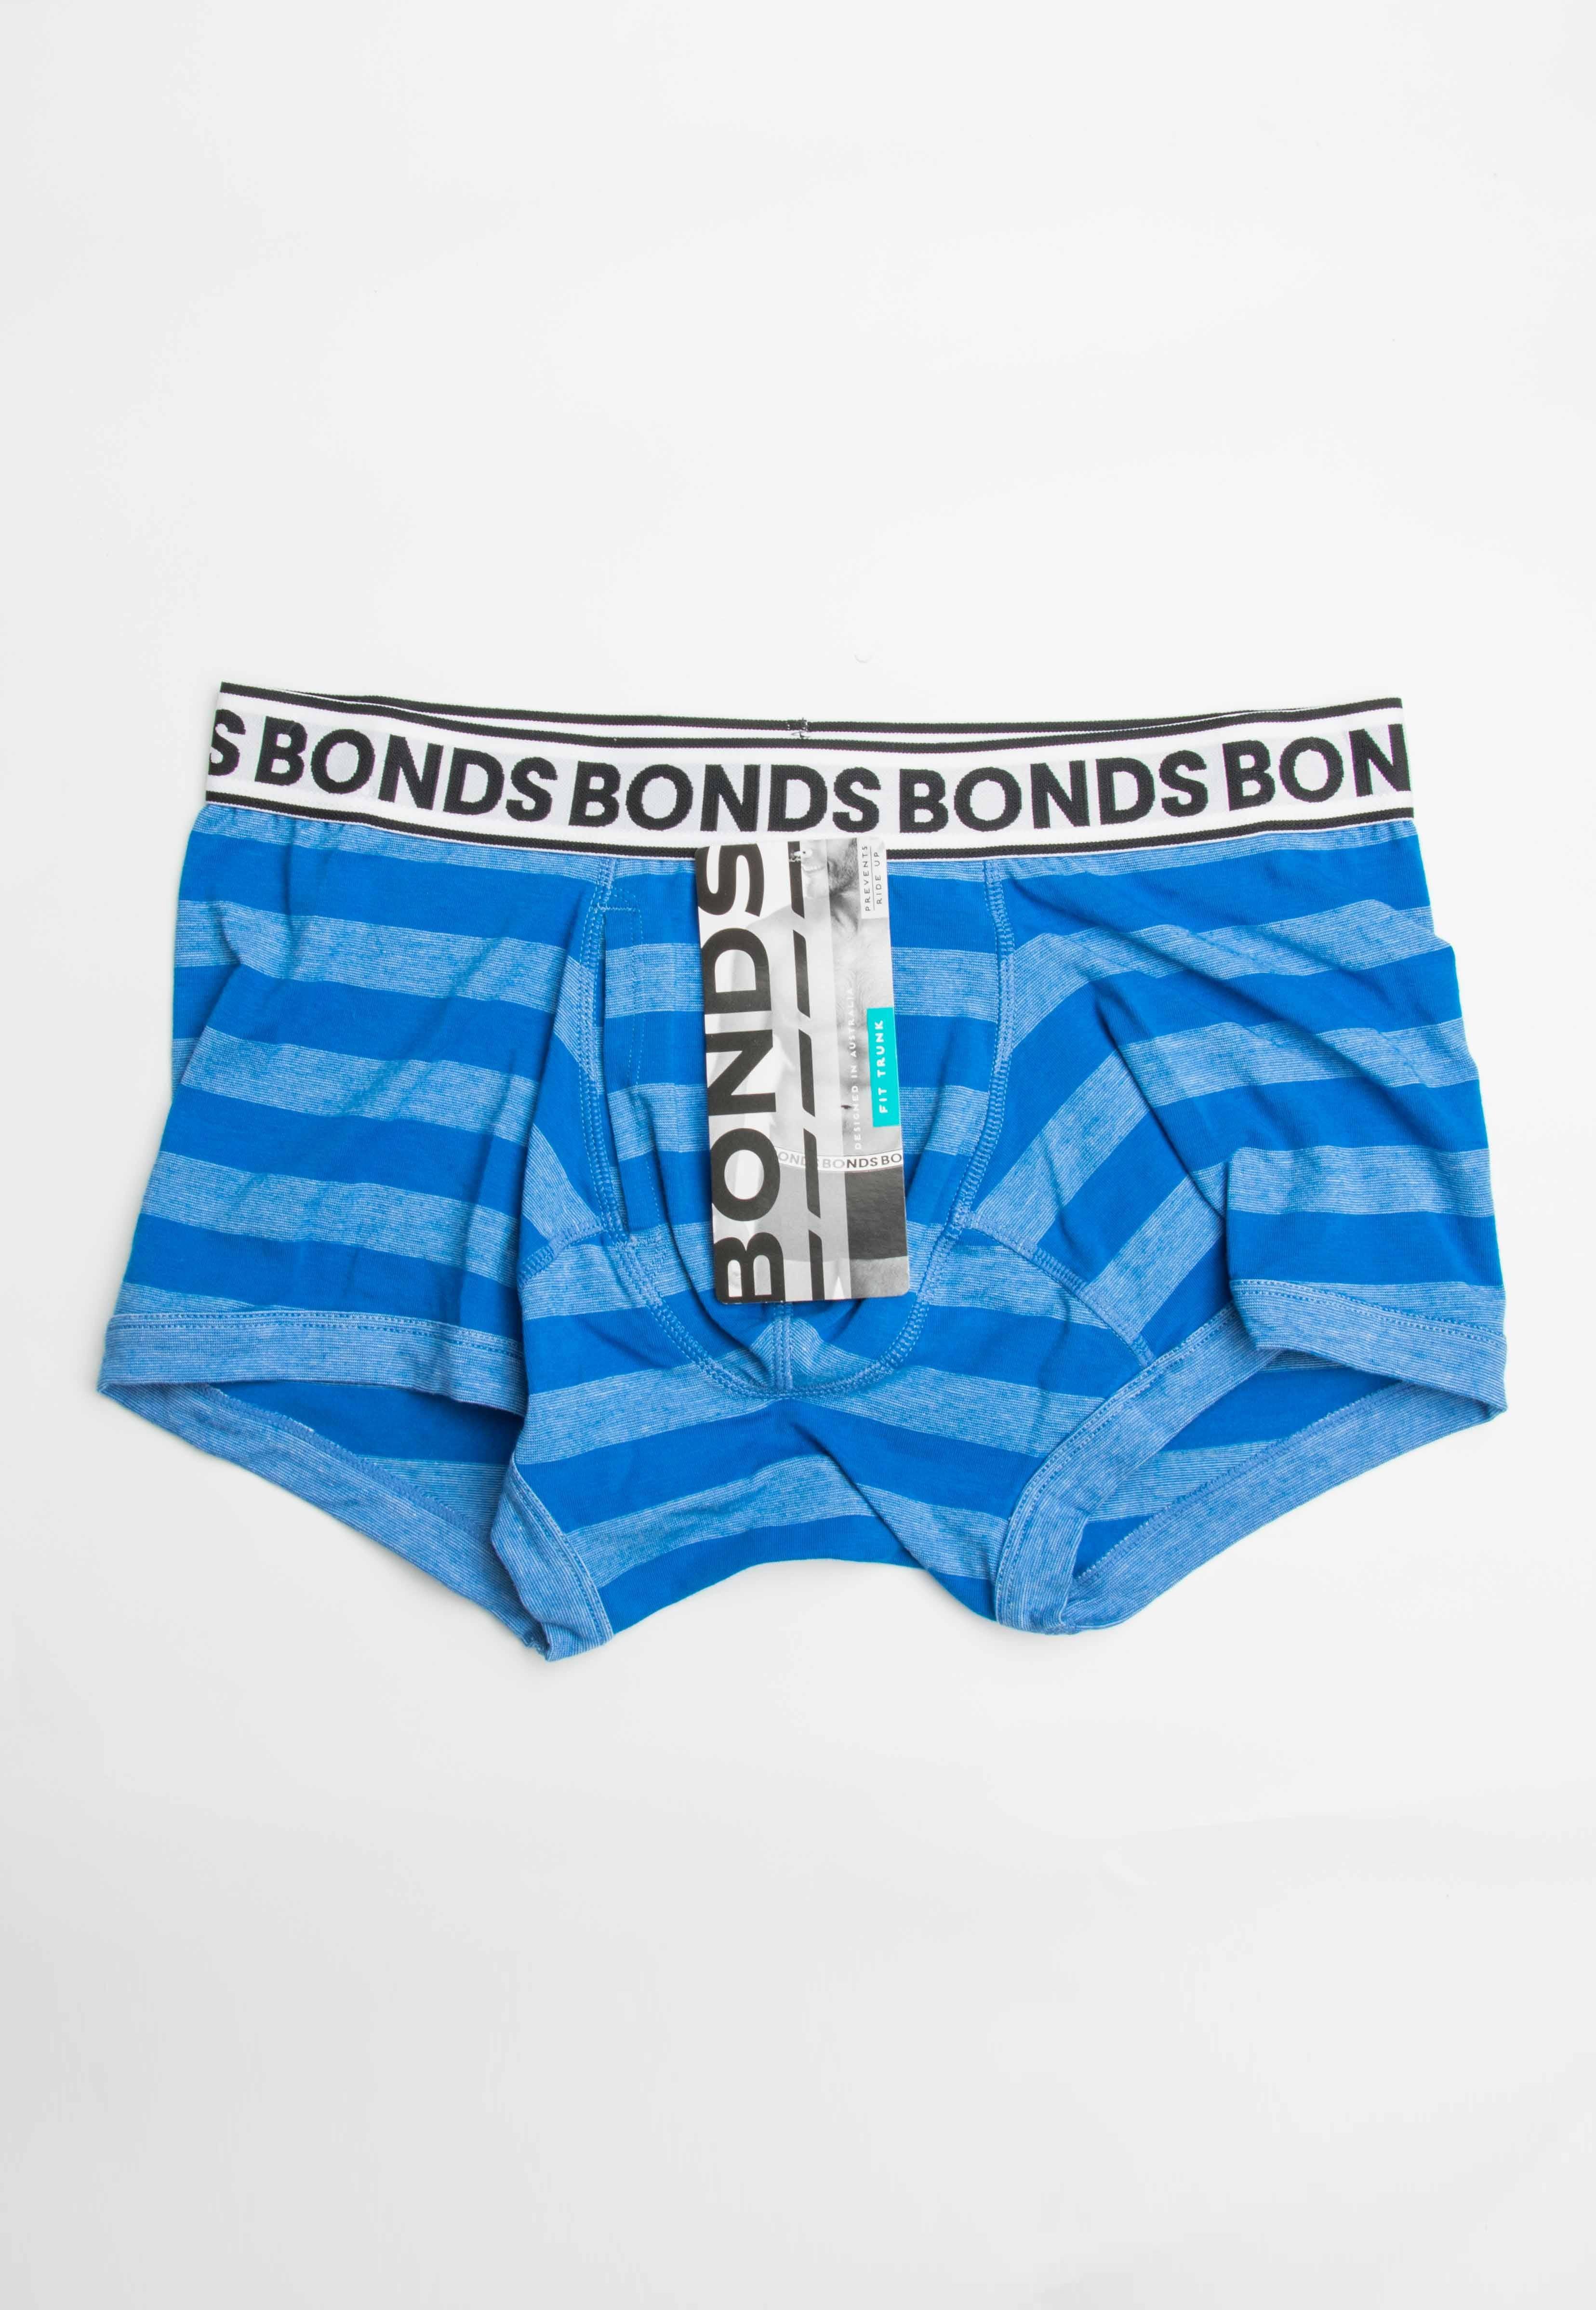 BONDS - Fit Stripe Trunk - STRIPE 15